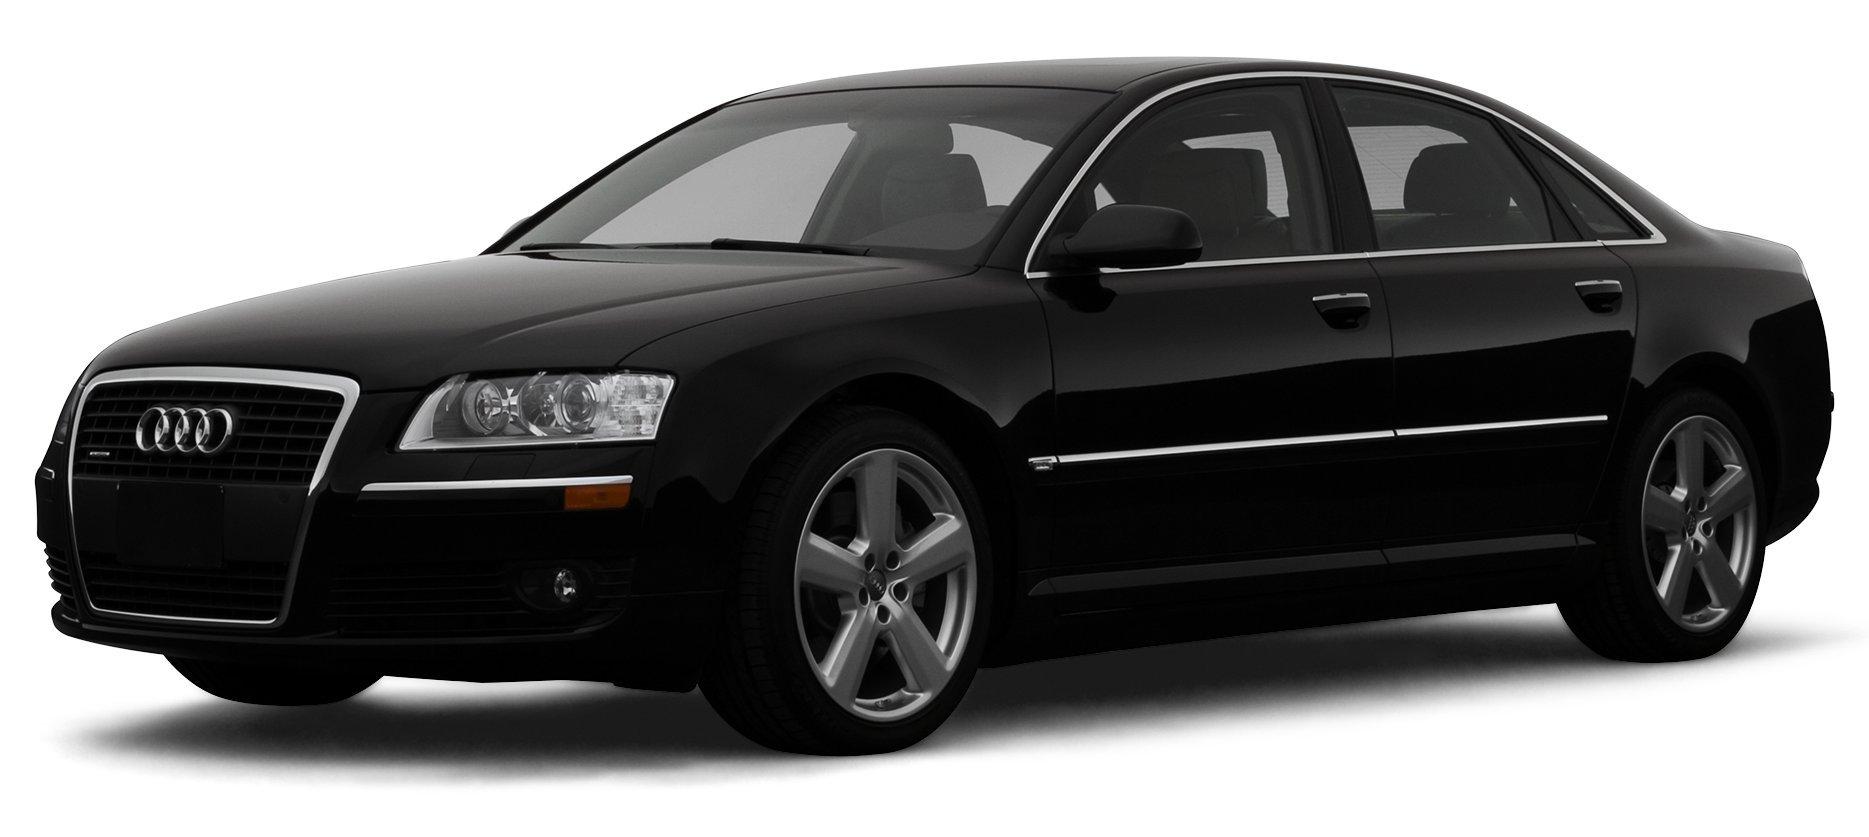 Amazoncom Audi A Quattro Reviews Images And Specs Vehicles - 2007 audi a8